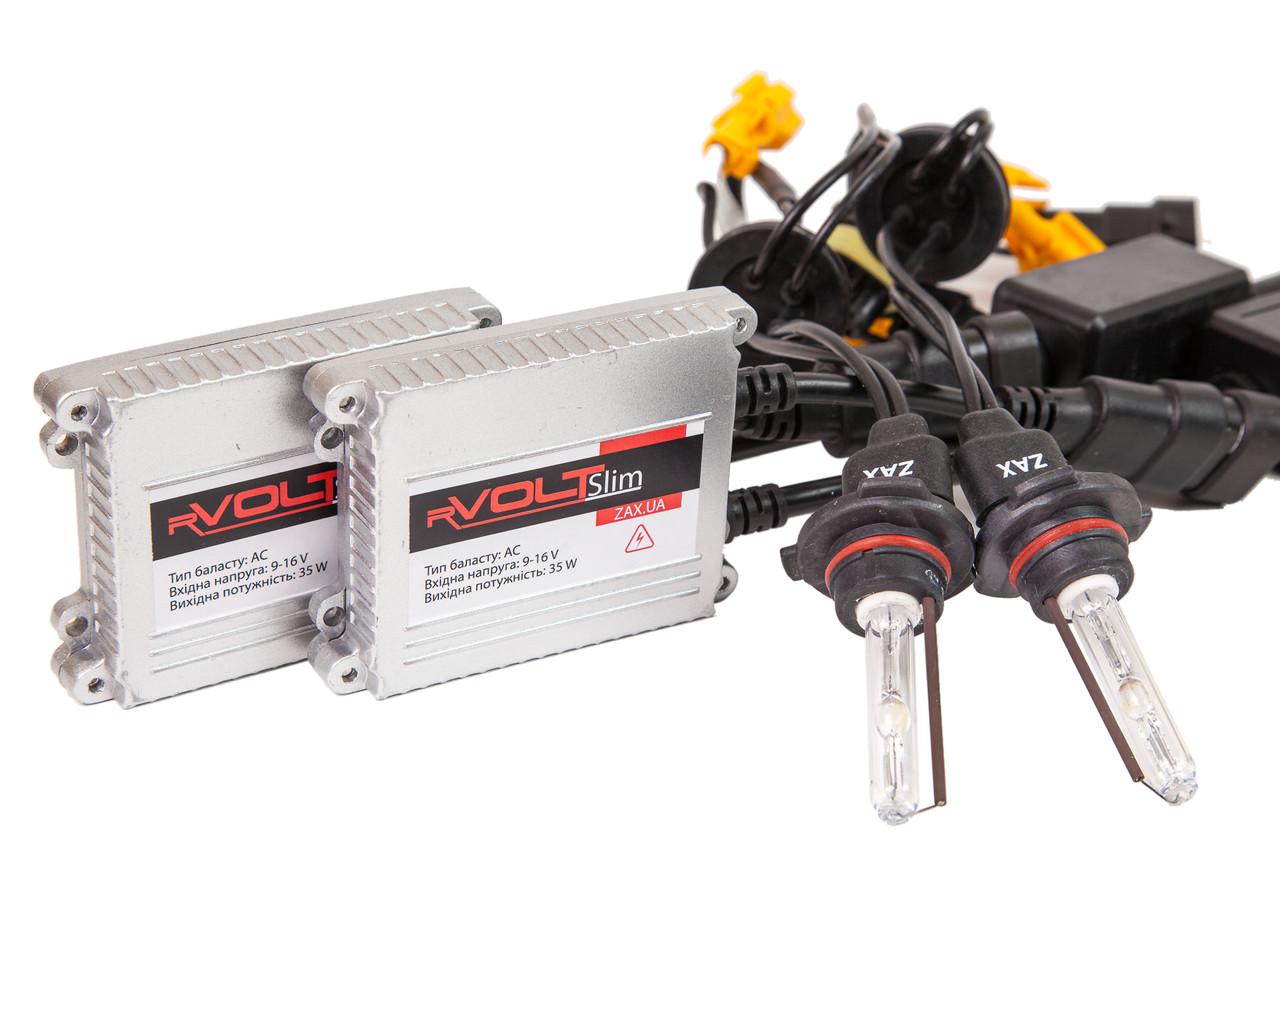 Комплект ксенона rVolt slim 35W 9-16V Zax ceramic HB3 (9005) 5000K